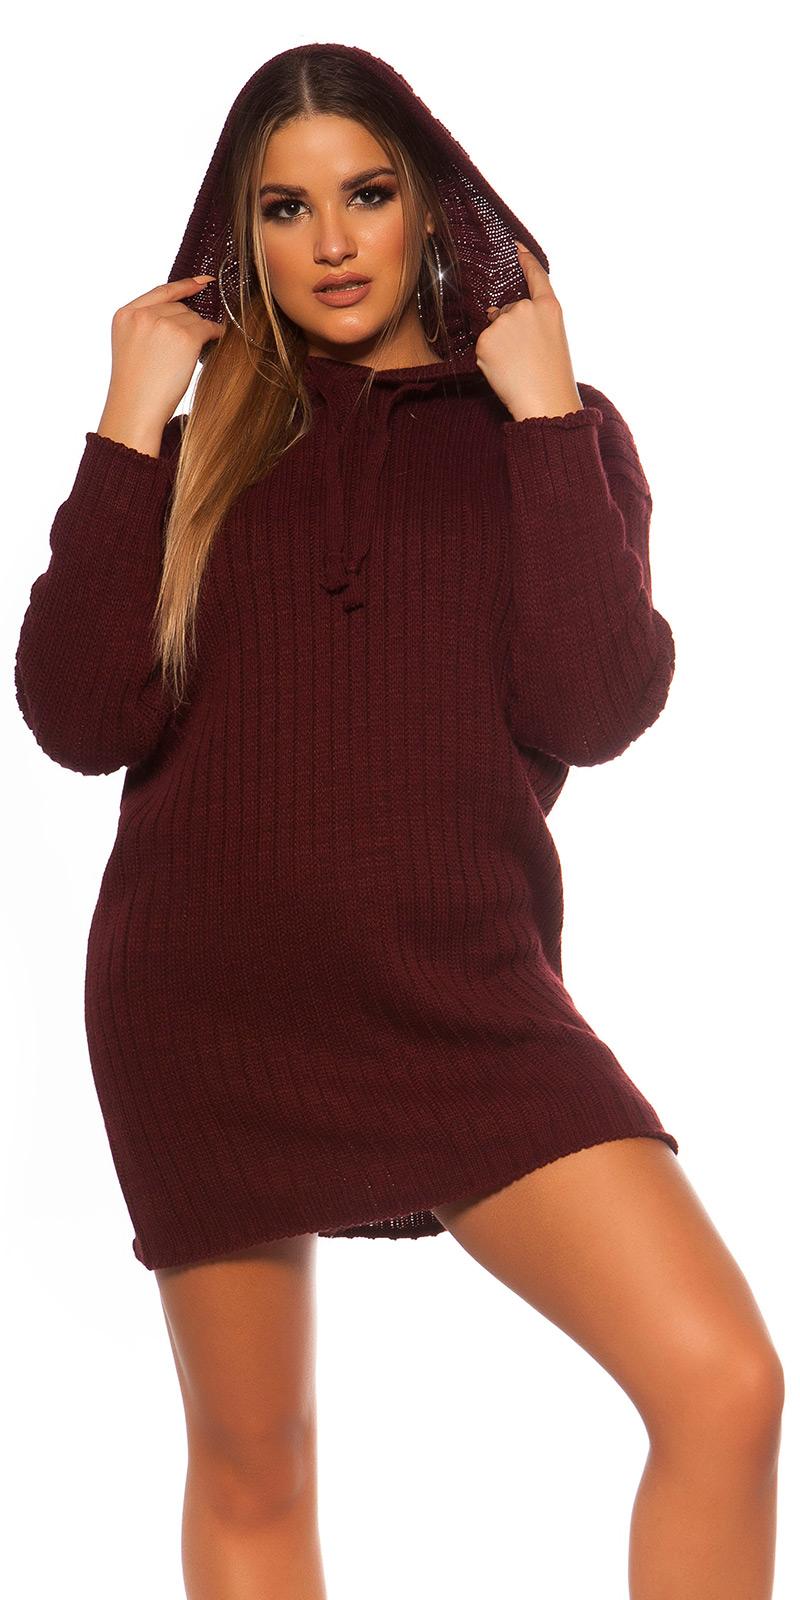 Rochie mini sexy XXL tricot cu gluga